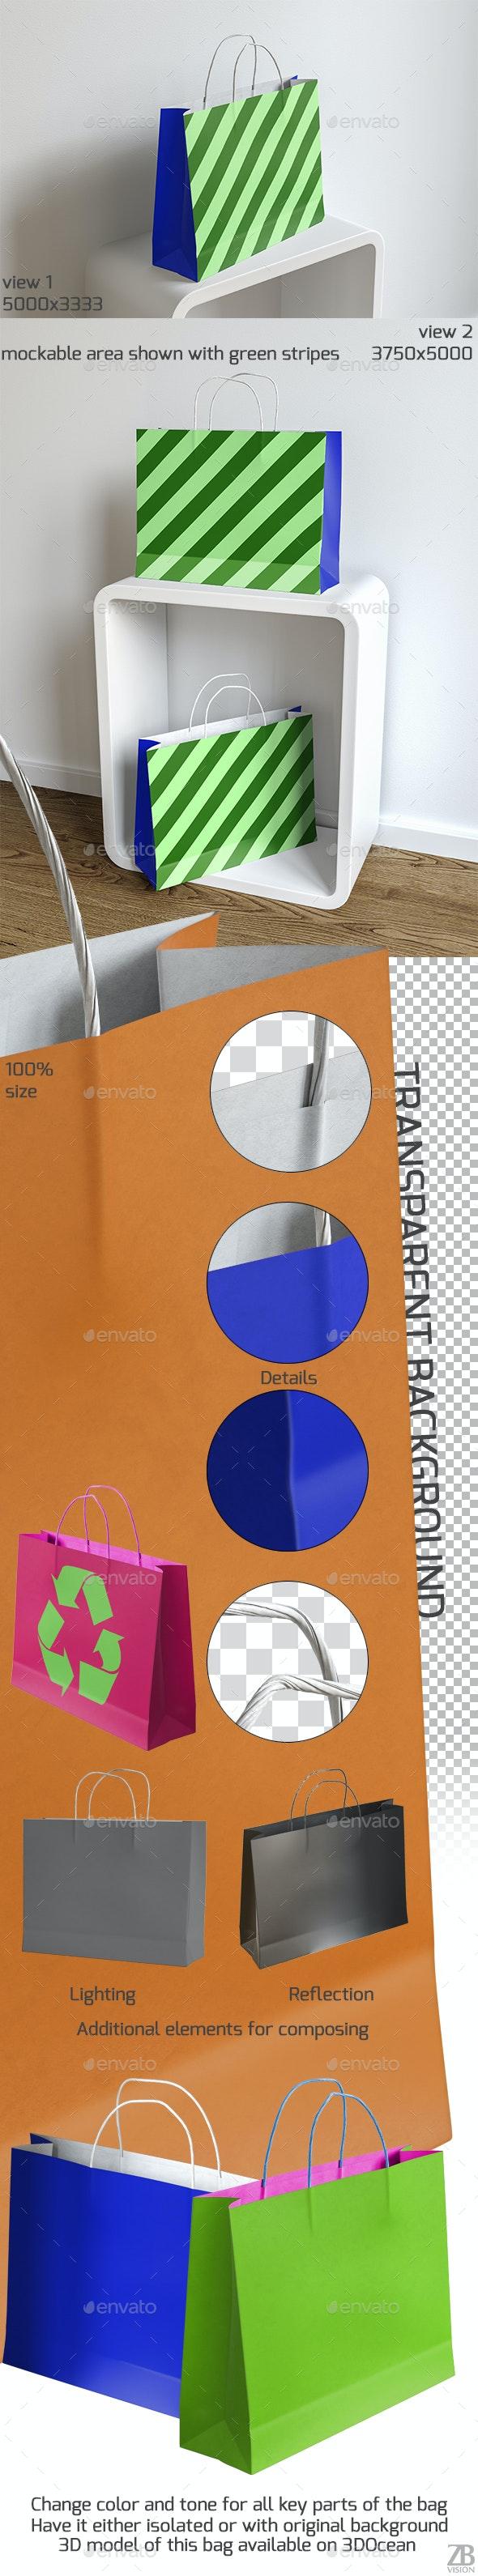 Shopping Bag Mock-up - Packaging Product Mock-Ups